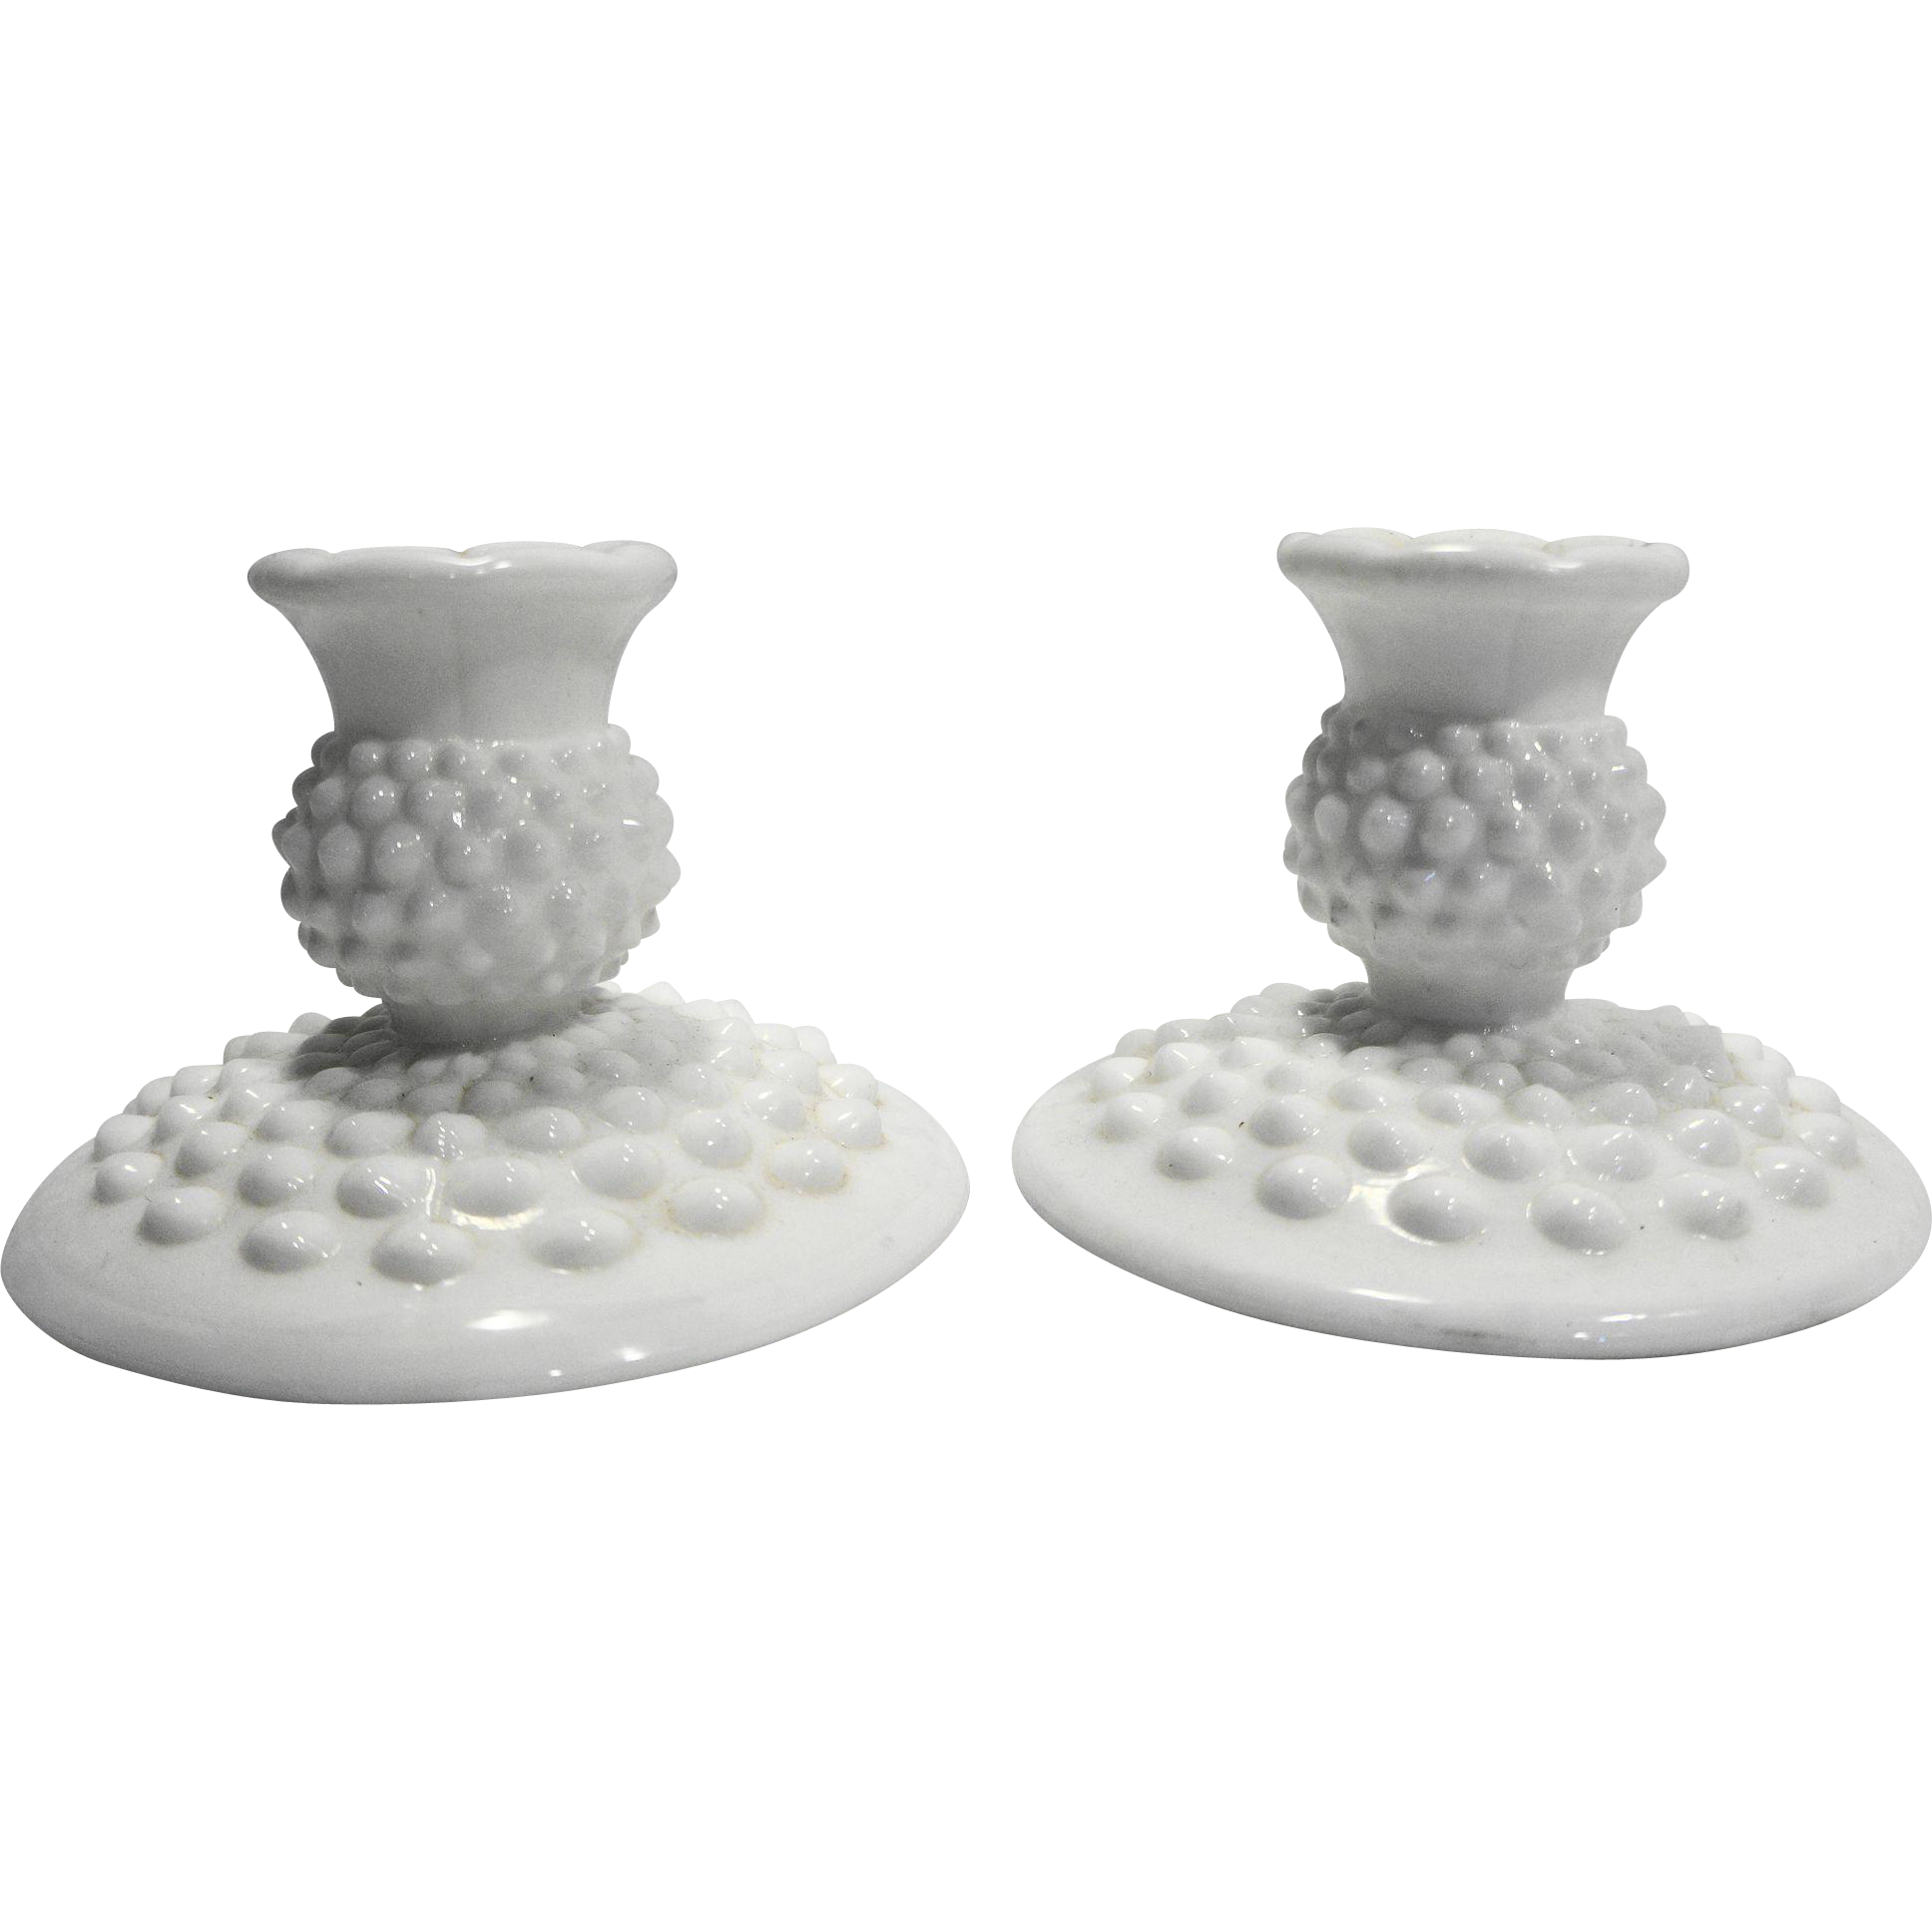 Fenton Hobnail White Milk Glass 3974 Candle Holders Pair Flat Foot Single Light Taper